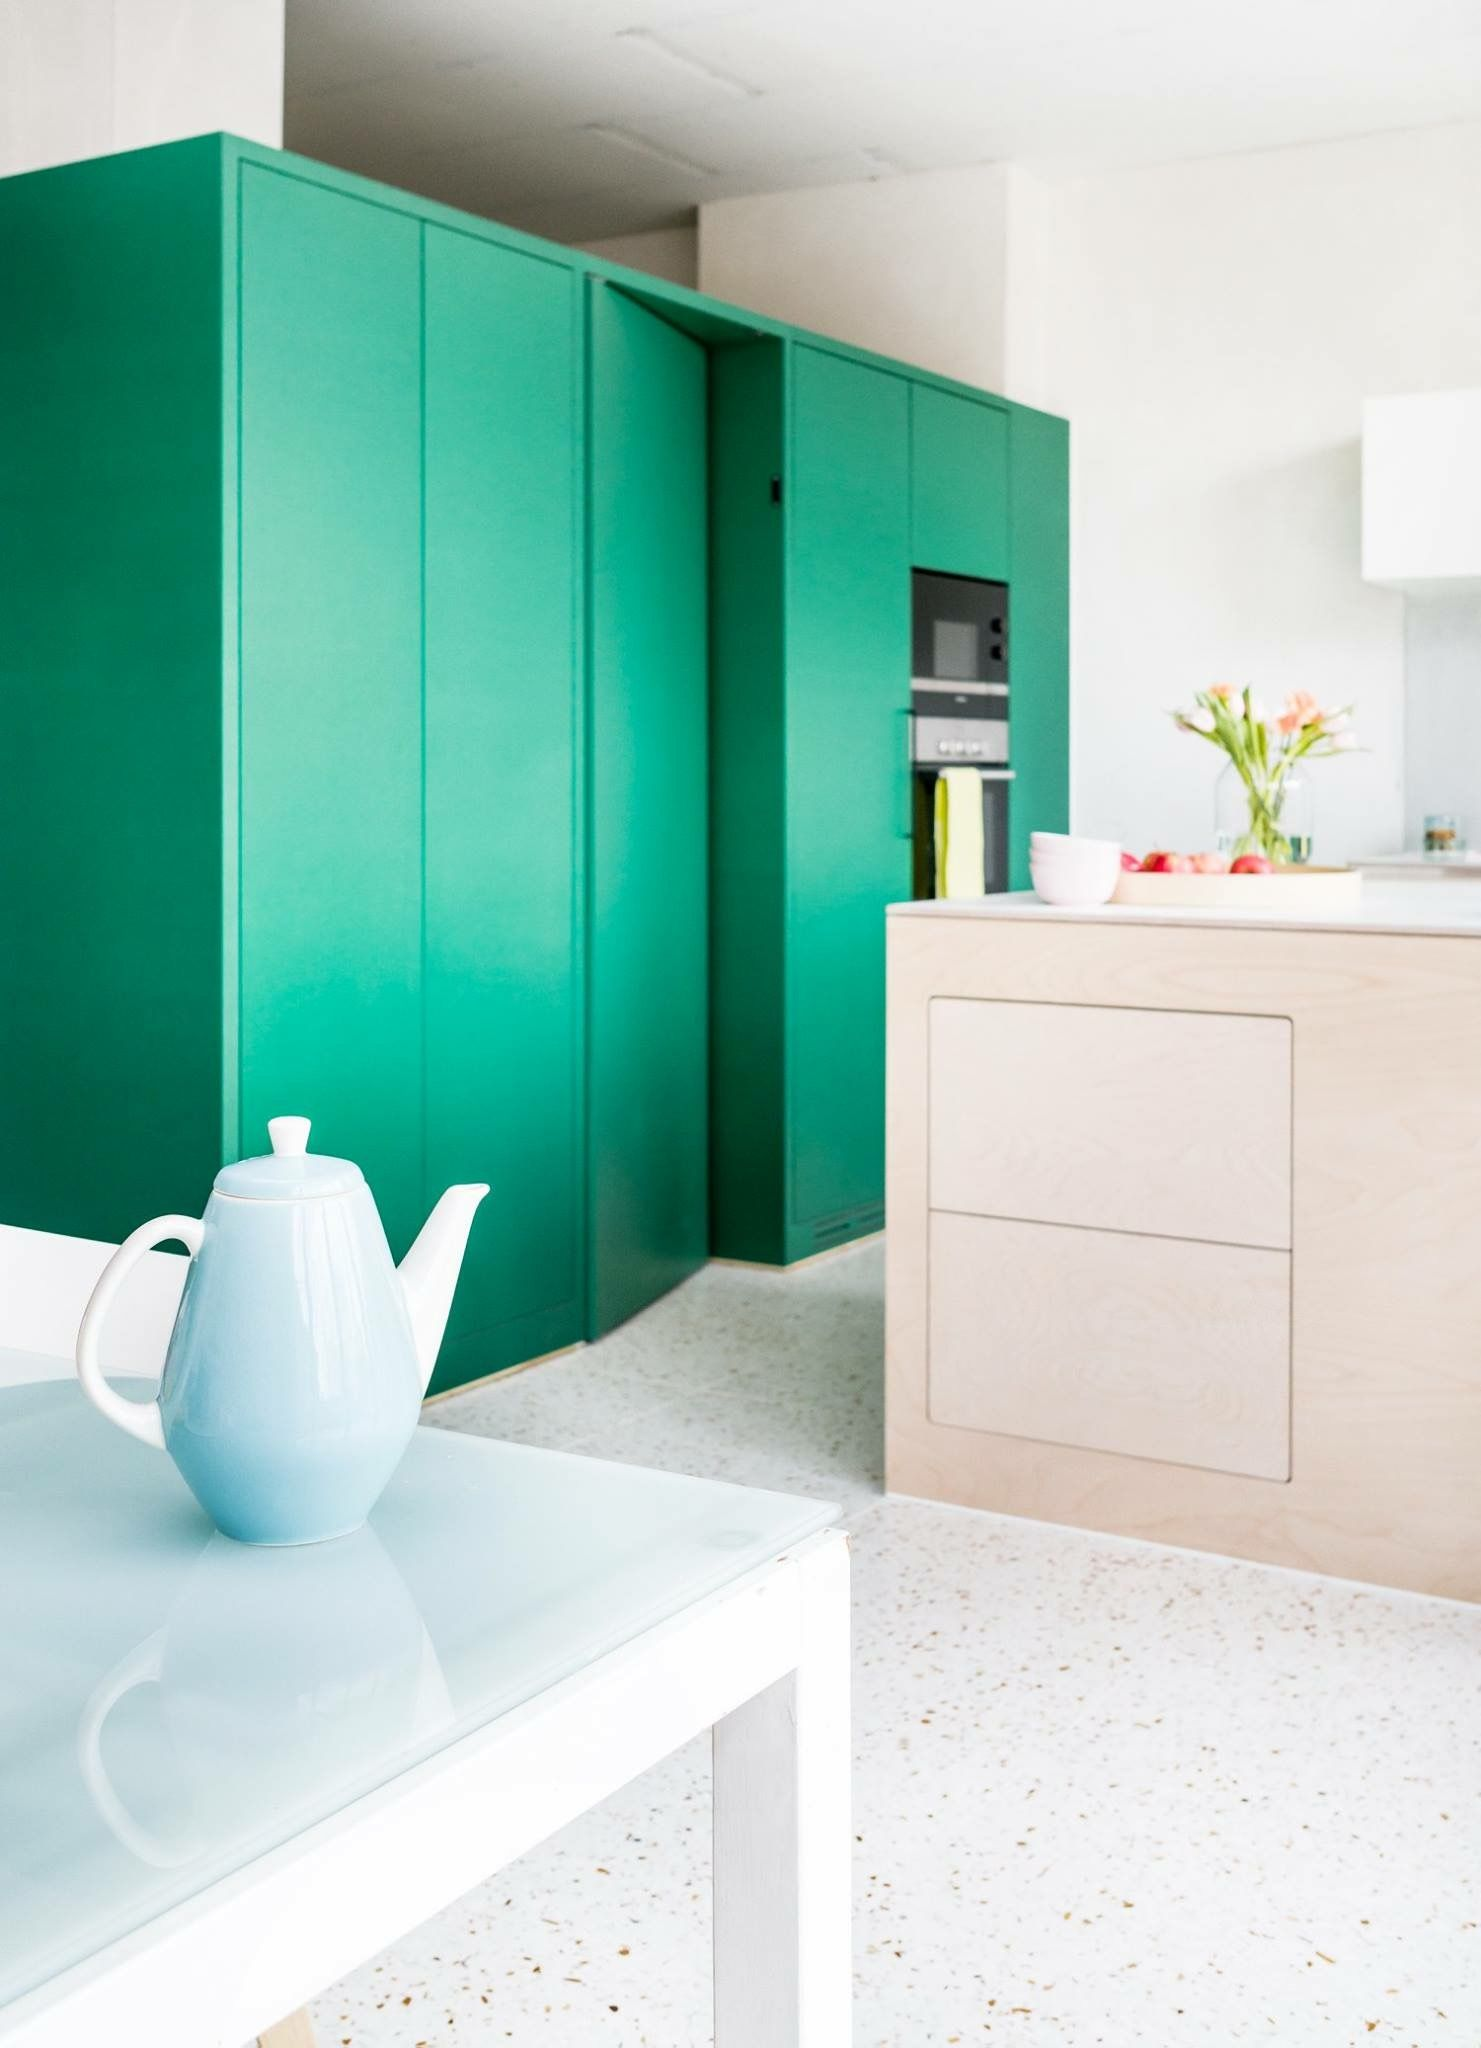 Pin by Elke Blyweert on interior   Pinterest   Modern kitchen ...